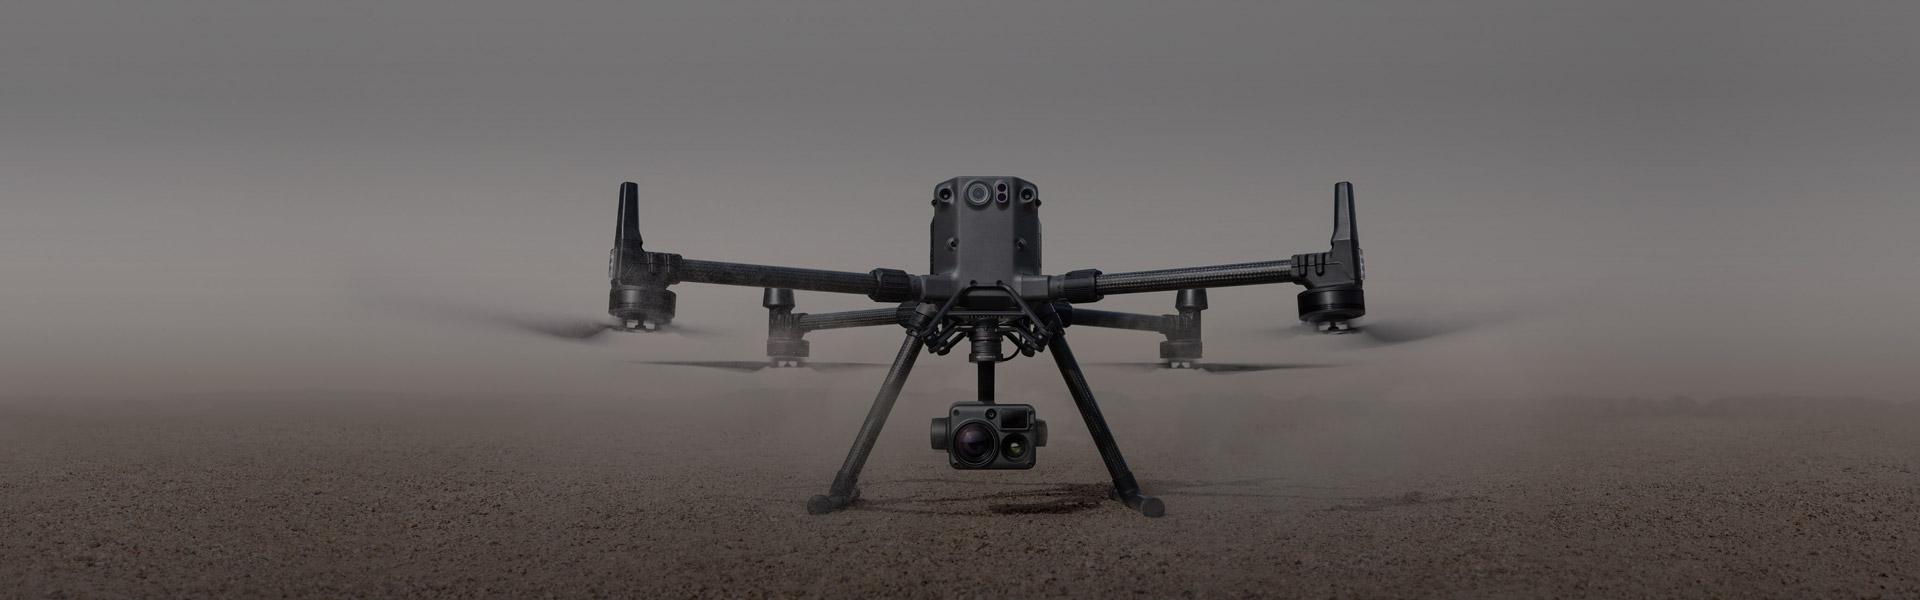 drone-cekim